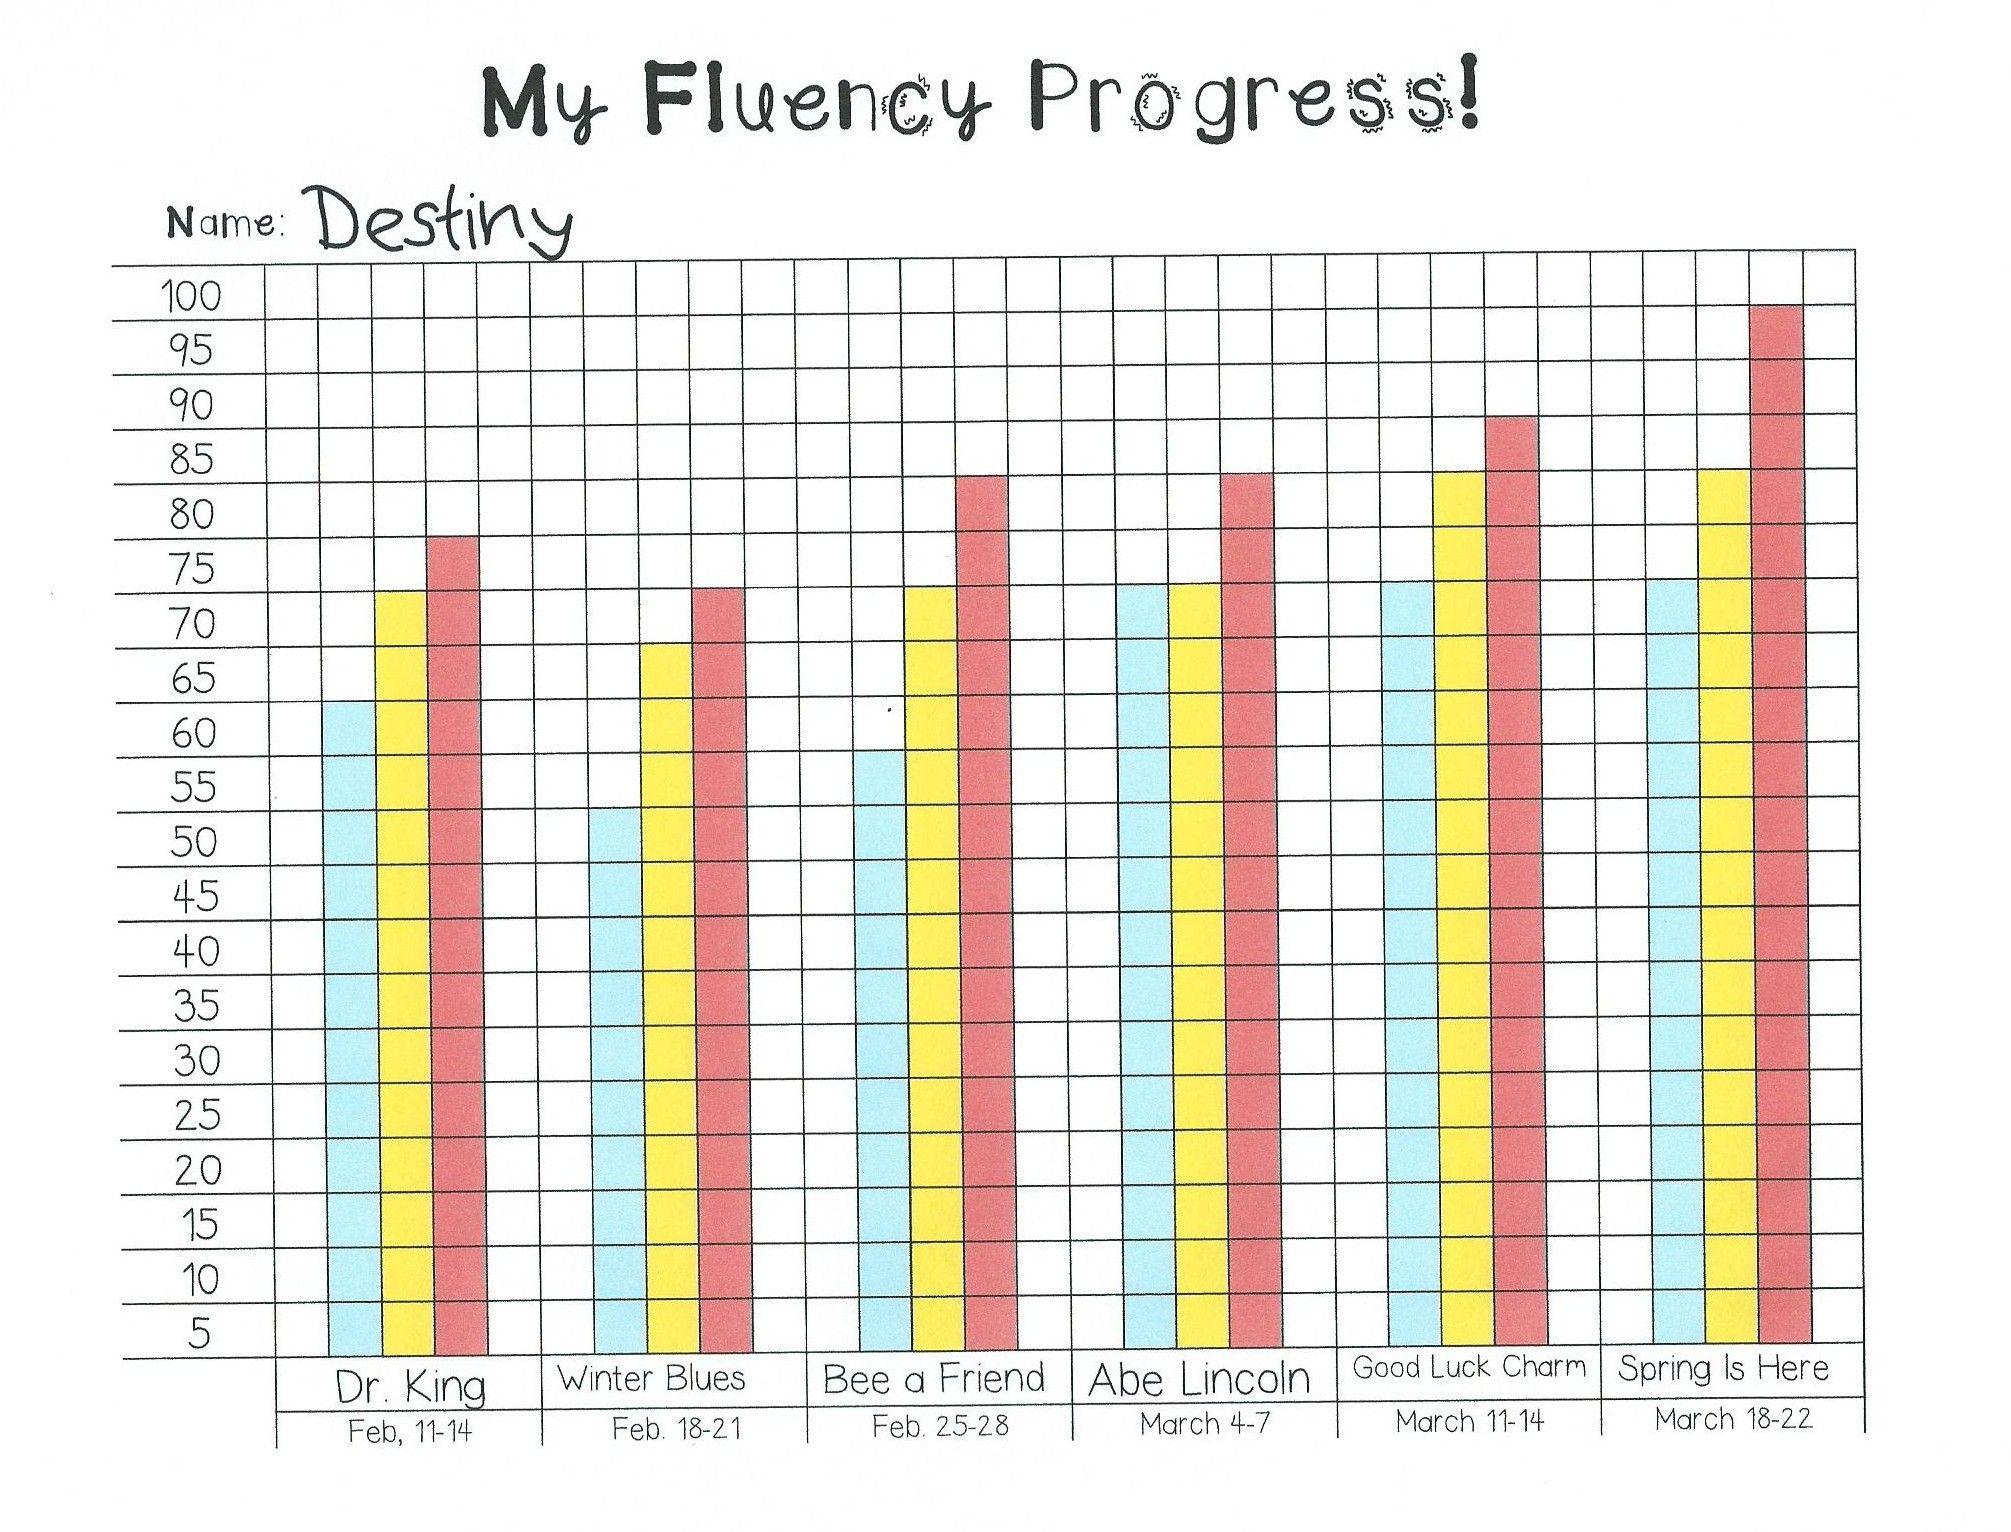 My Fluency Progress Monitoring Graph